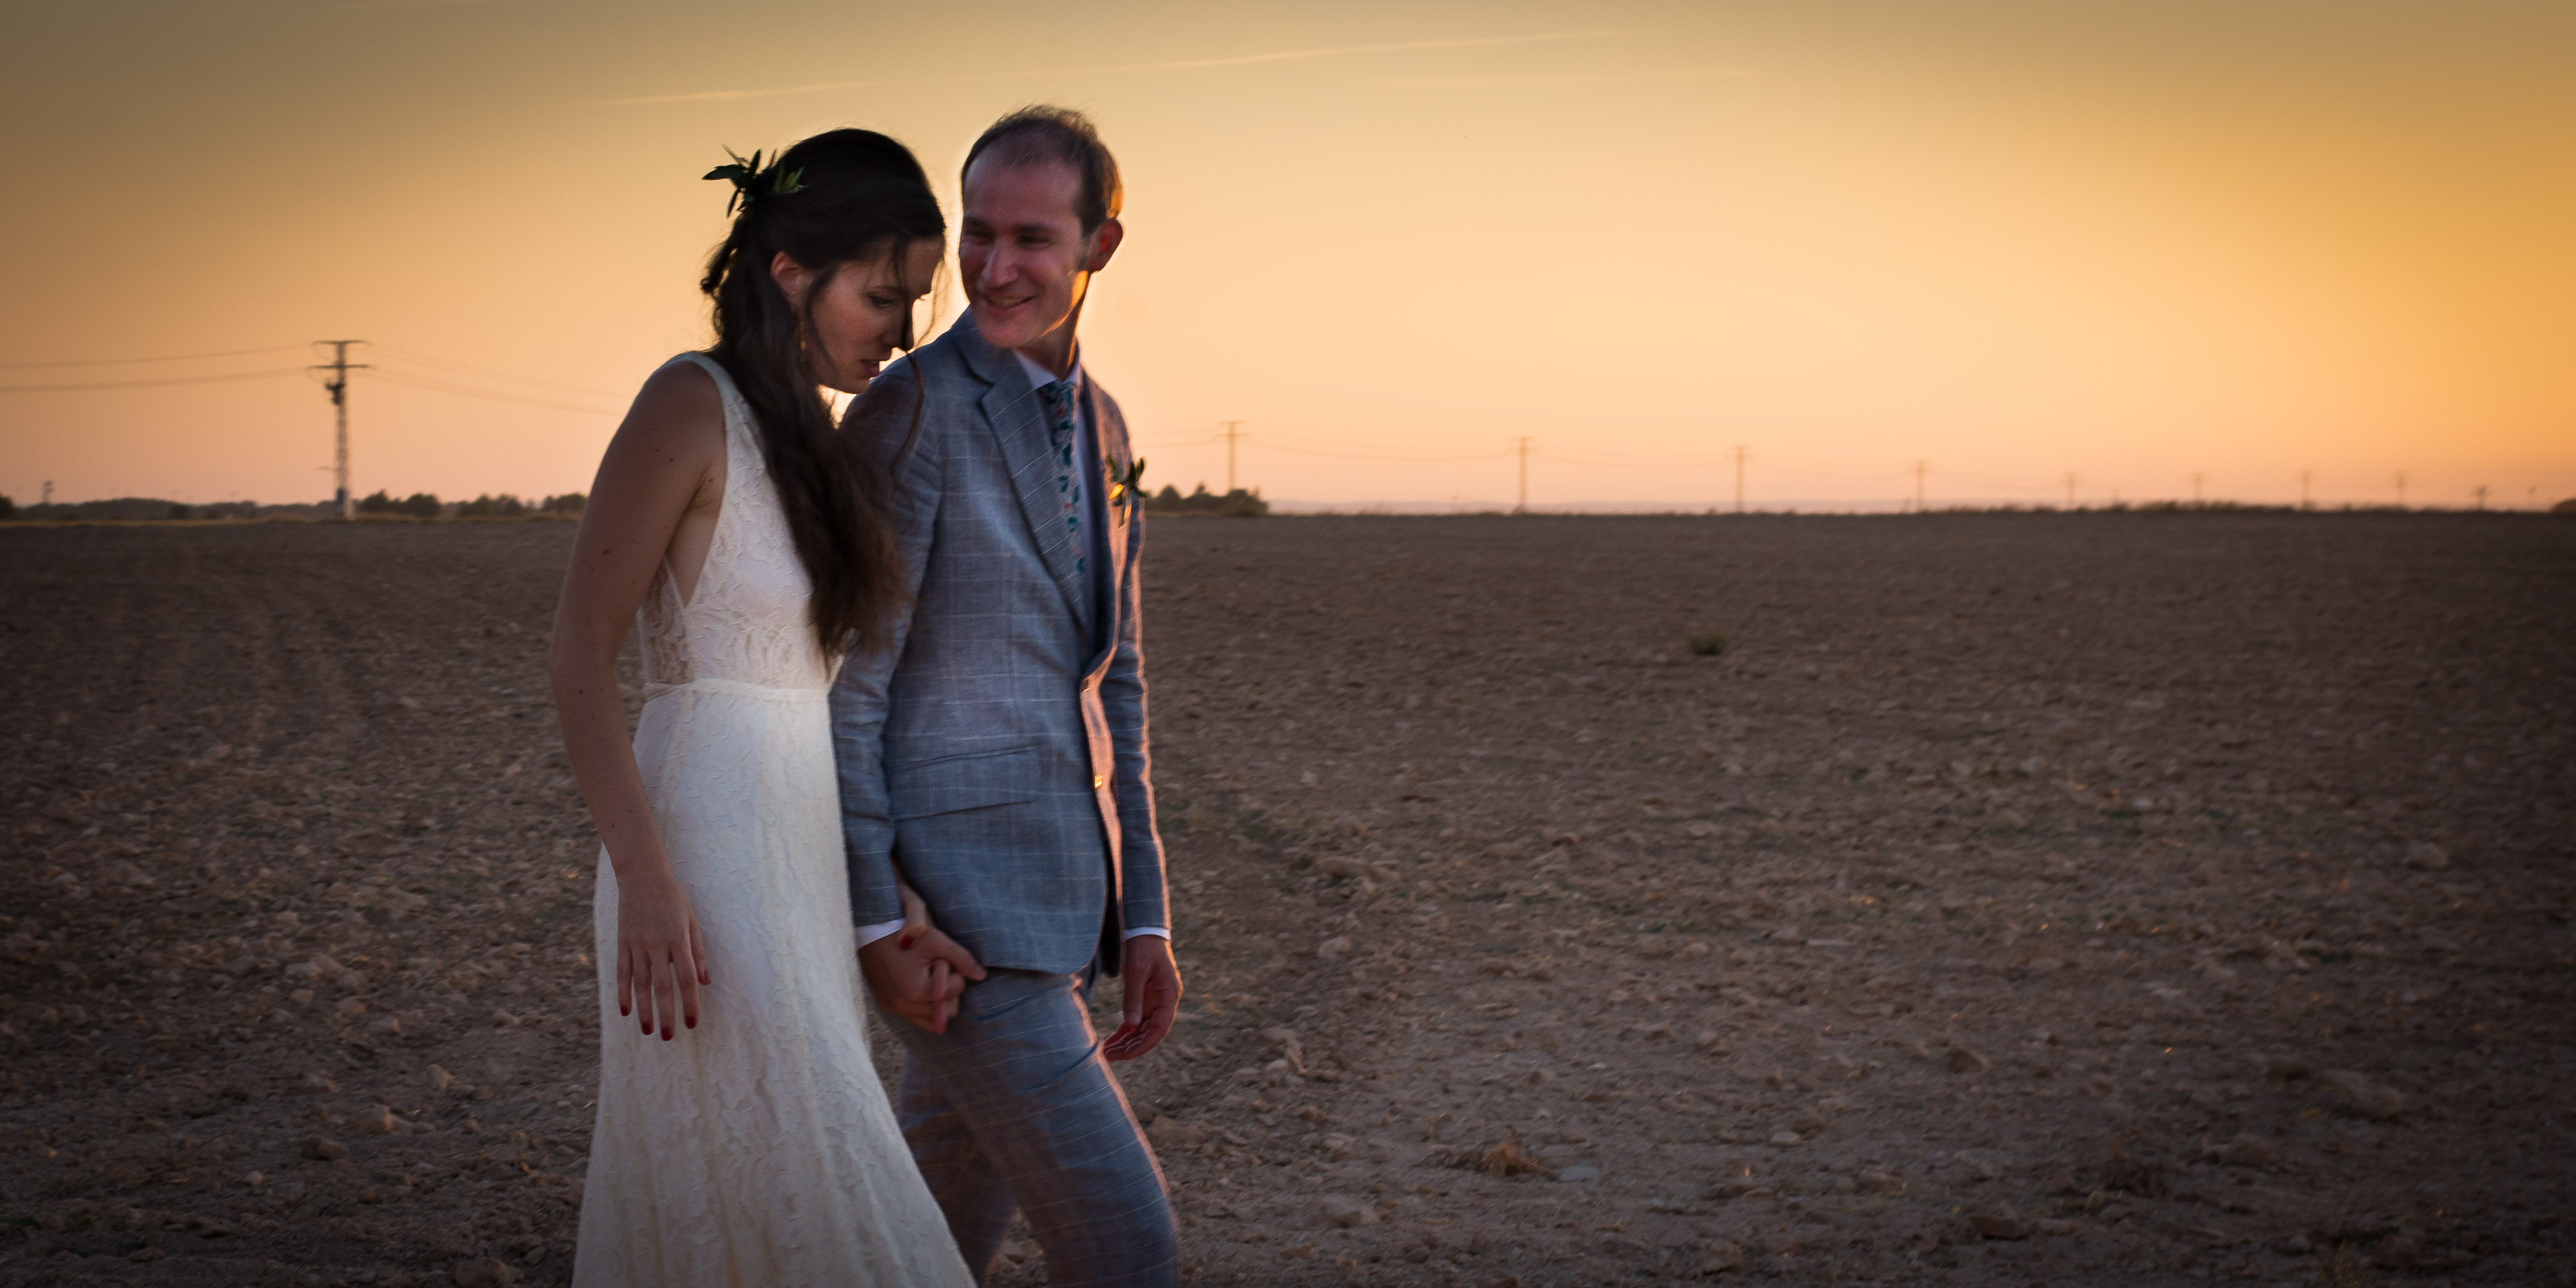 Patri y Napo - Chema Moragón. Fotógrafo.